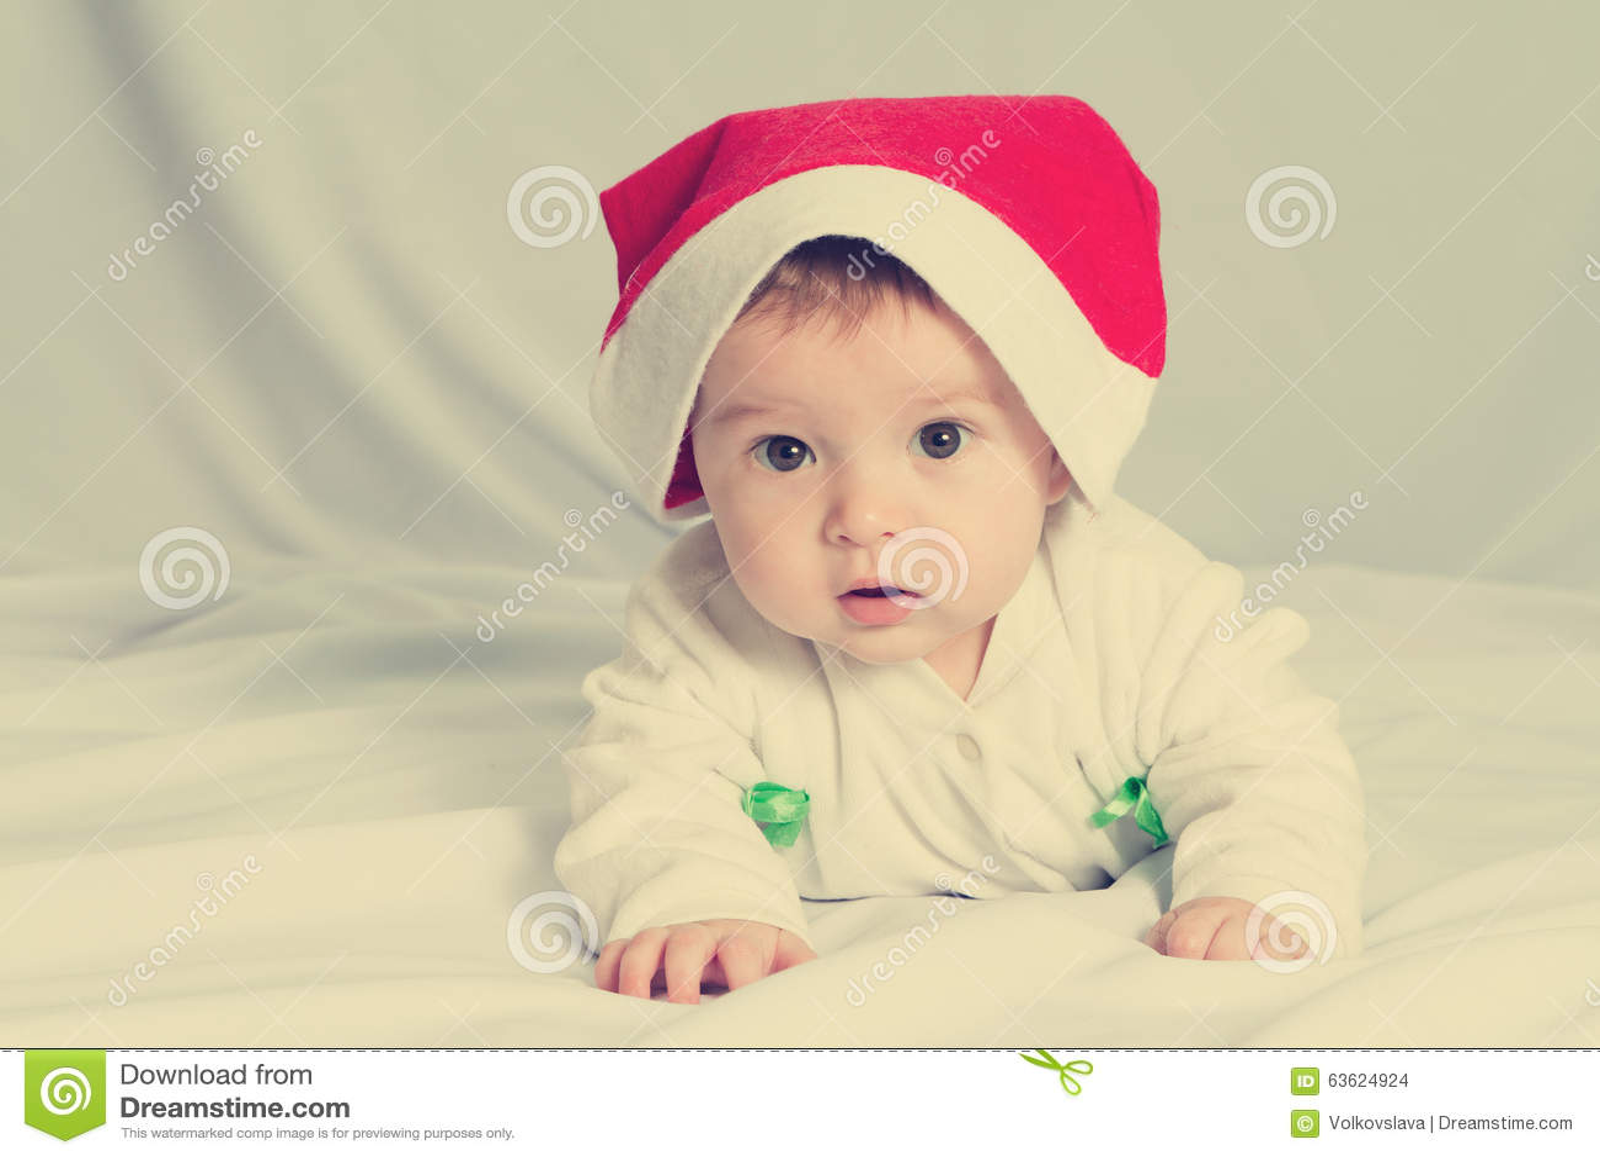 ca523dc4729 Cute Happy Newborn Baby In Christmas Hat Stock Photo - Image of ...